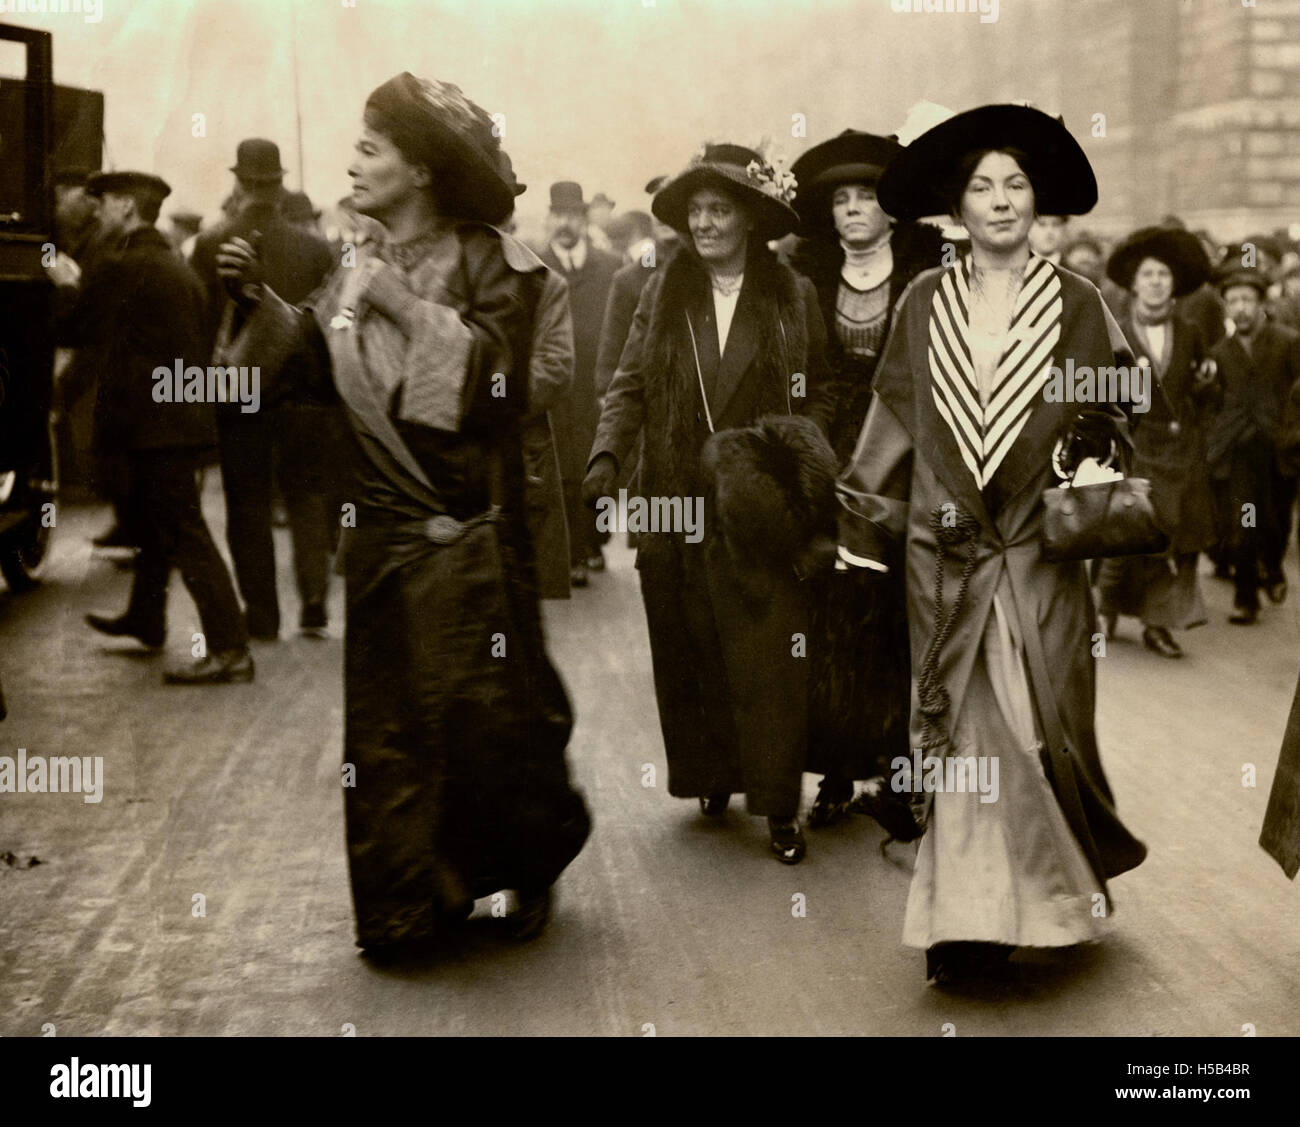 Emmeline Pethick Lawrence et Sylvain Pankhurst, c.1908-1912. Banque D'Images